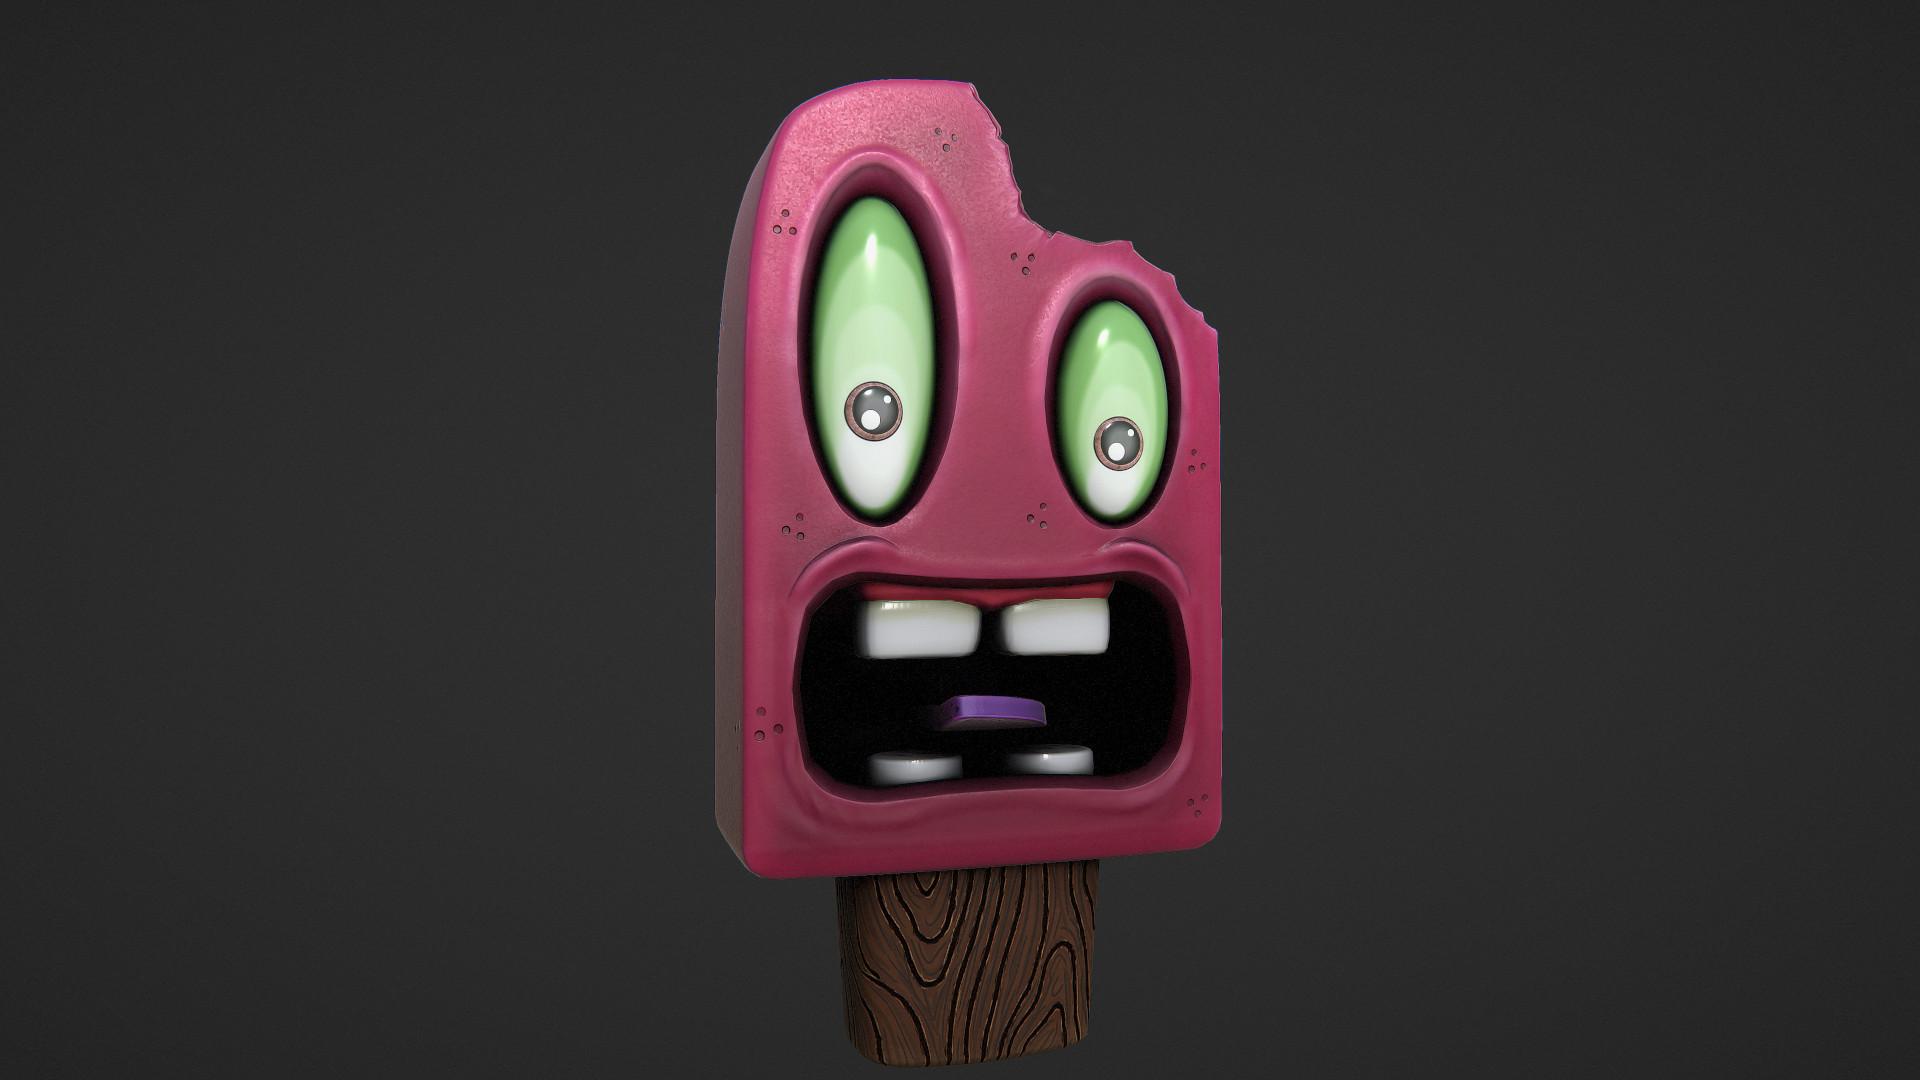 ArtStation Popsicle Joe Grabowski